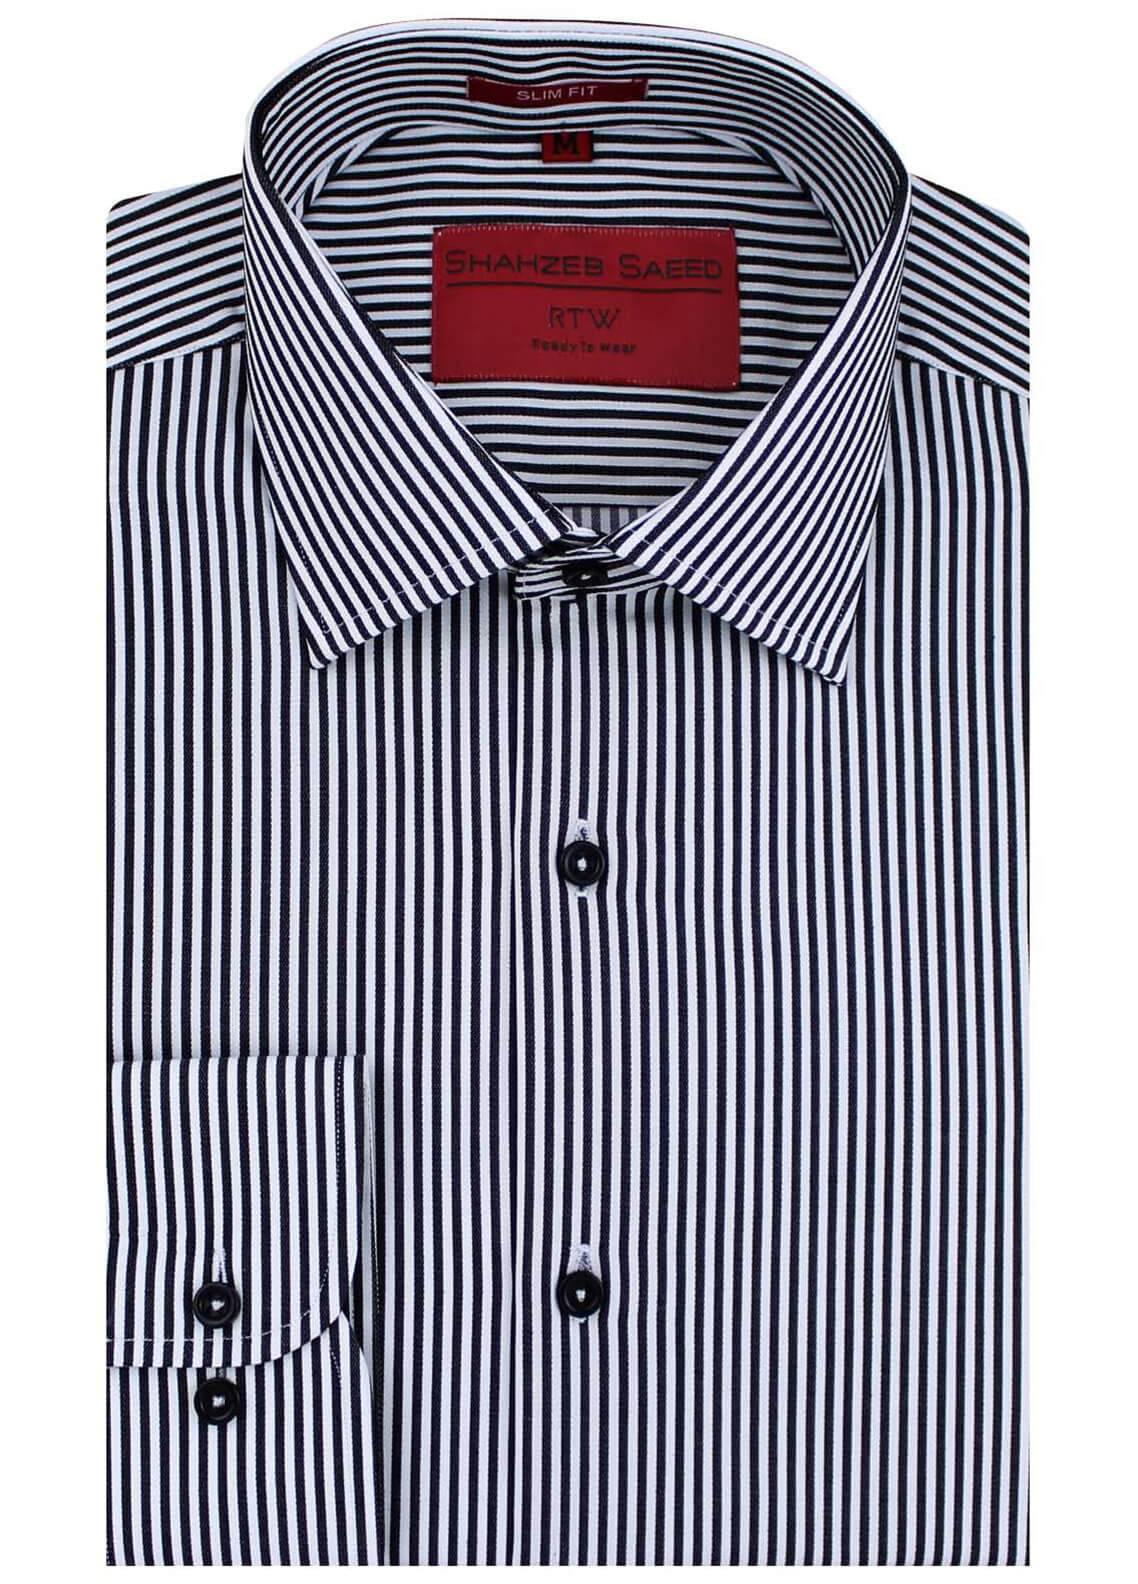 Shahzeb Saeed Cotton Formal Men Shirts - Black RTW-1454